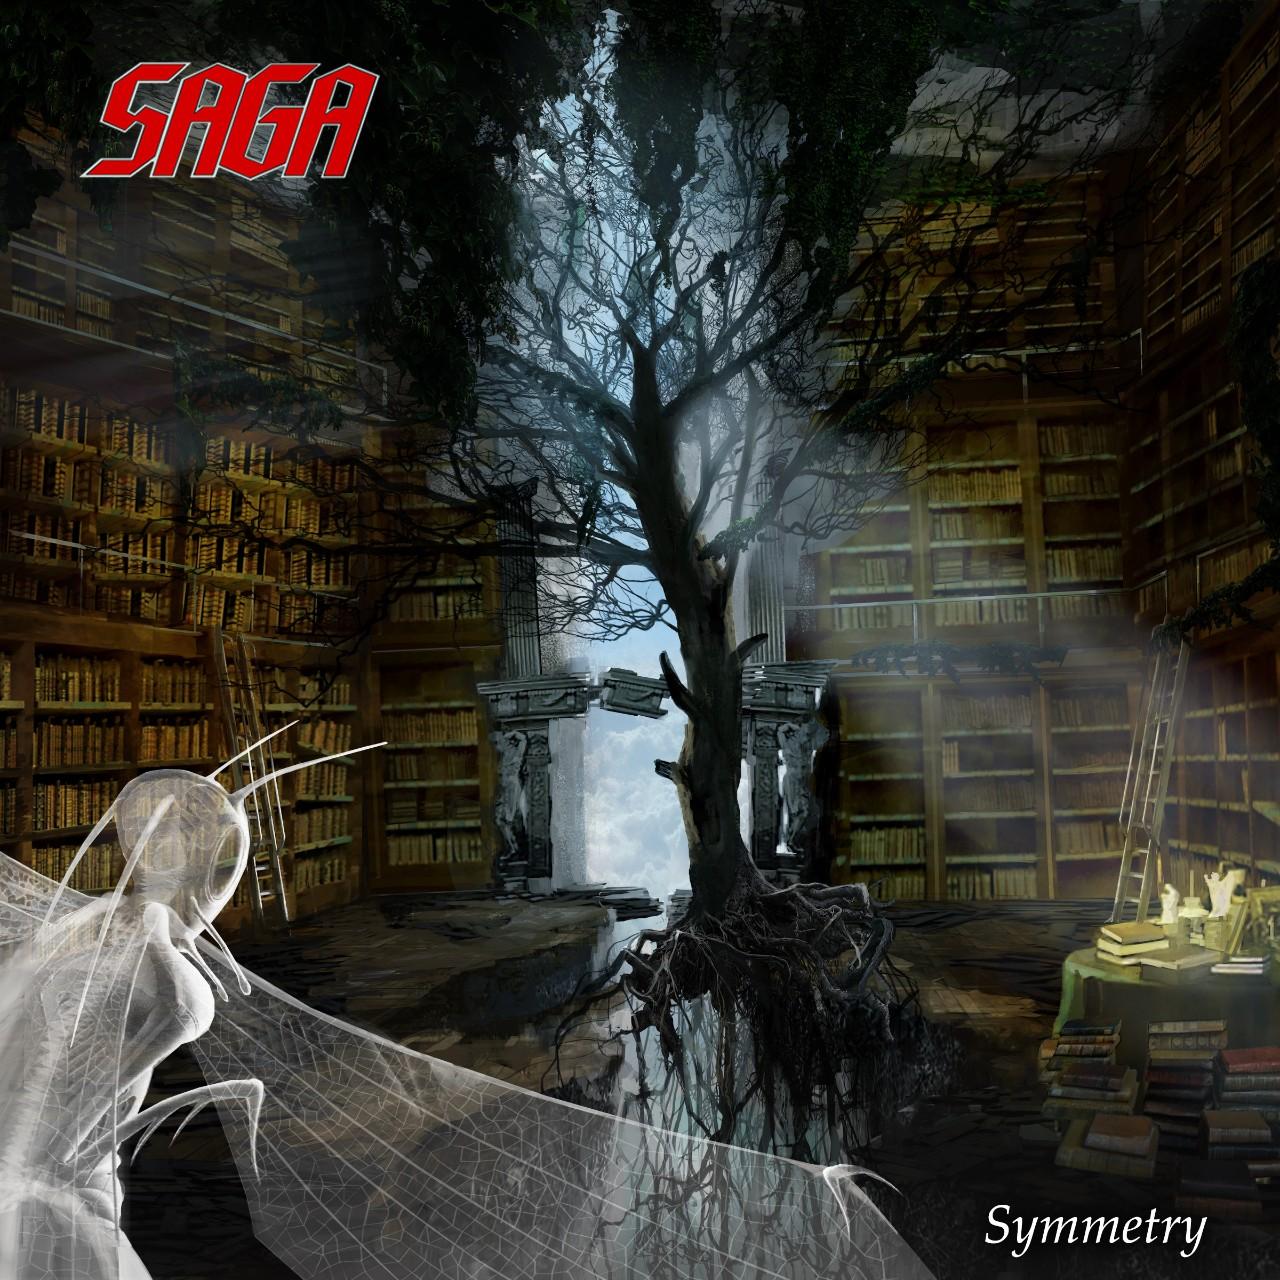 Saga Symmetry hbls